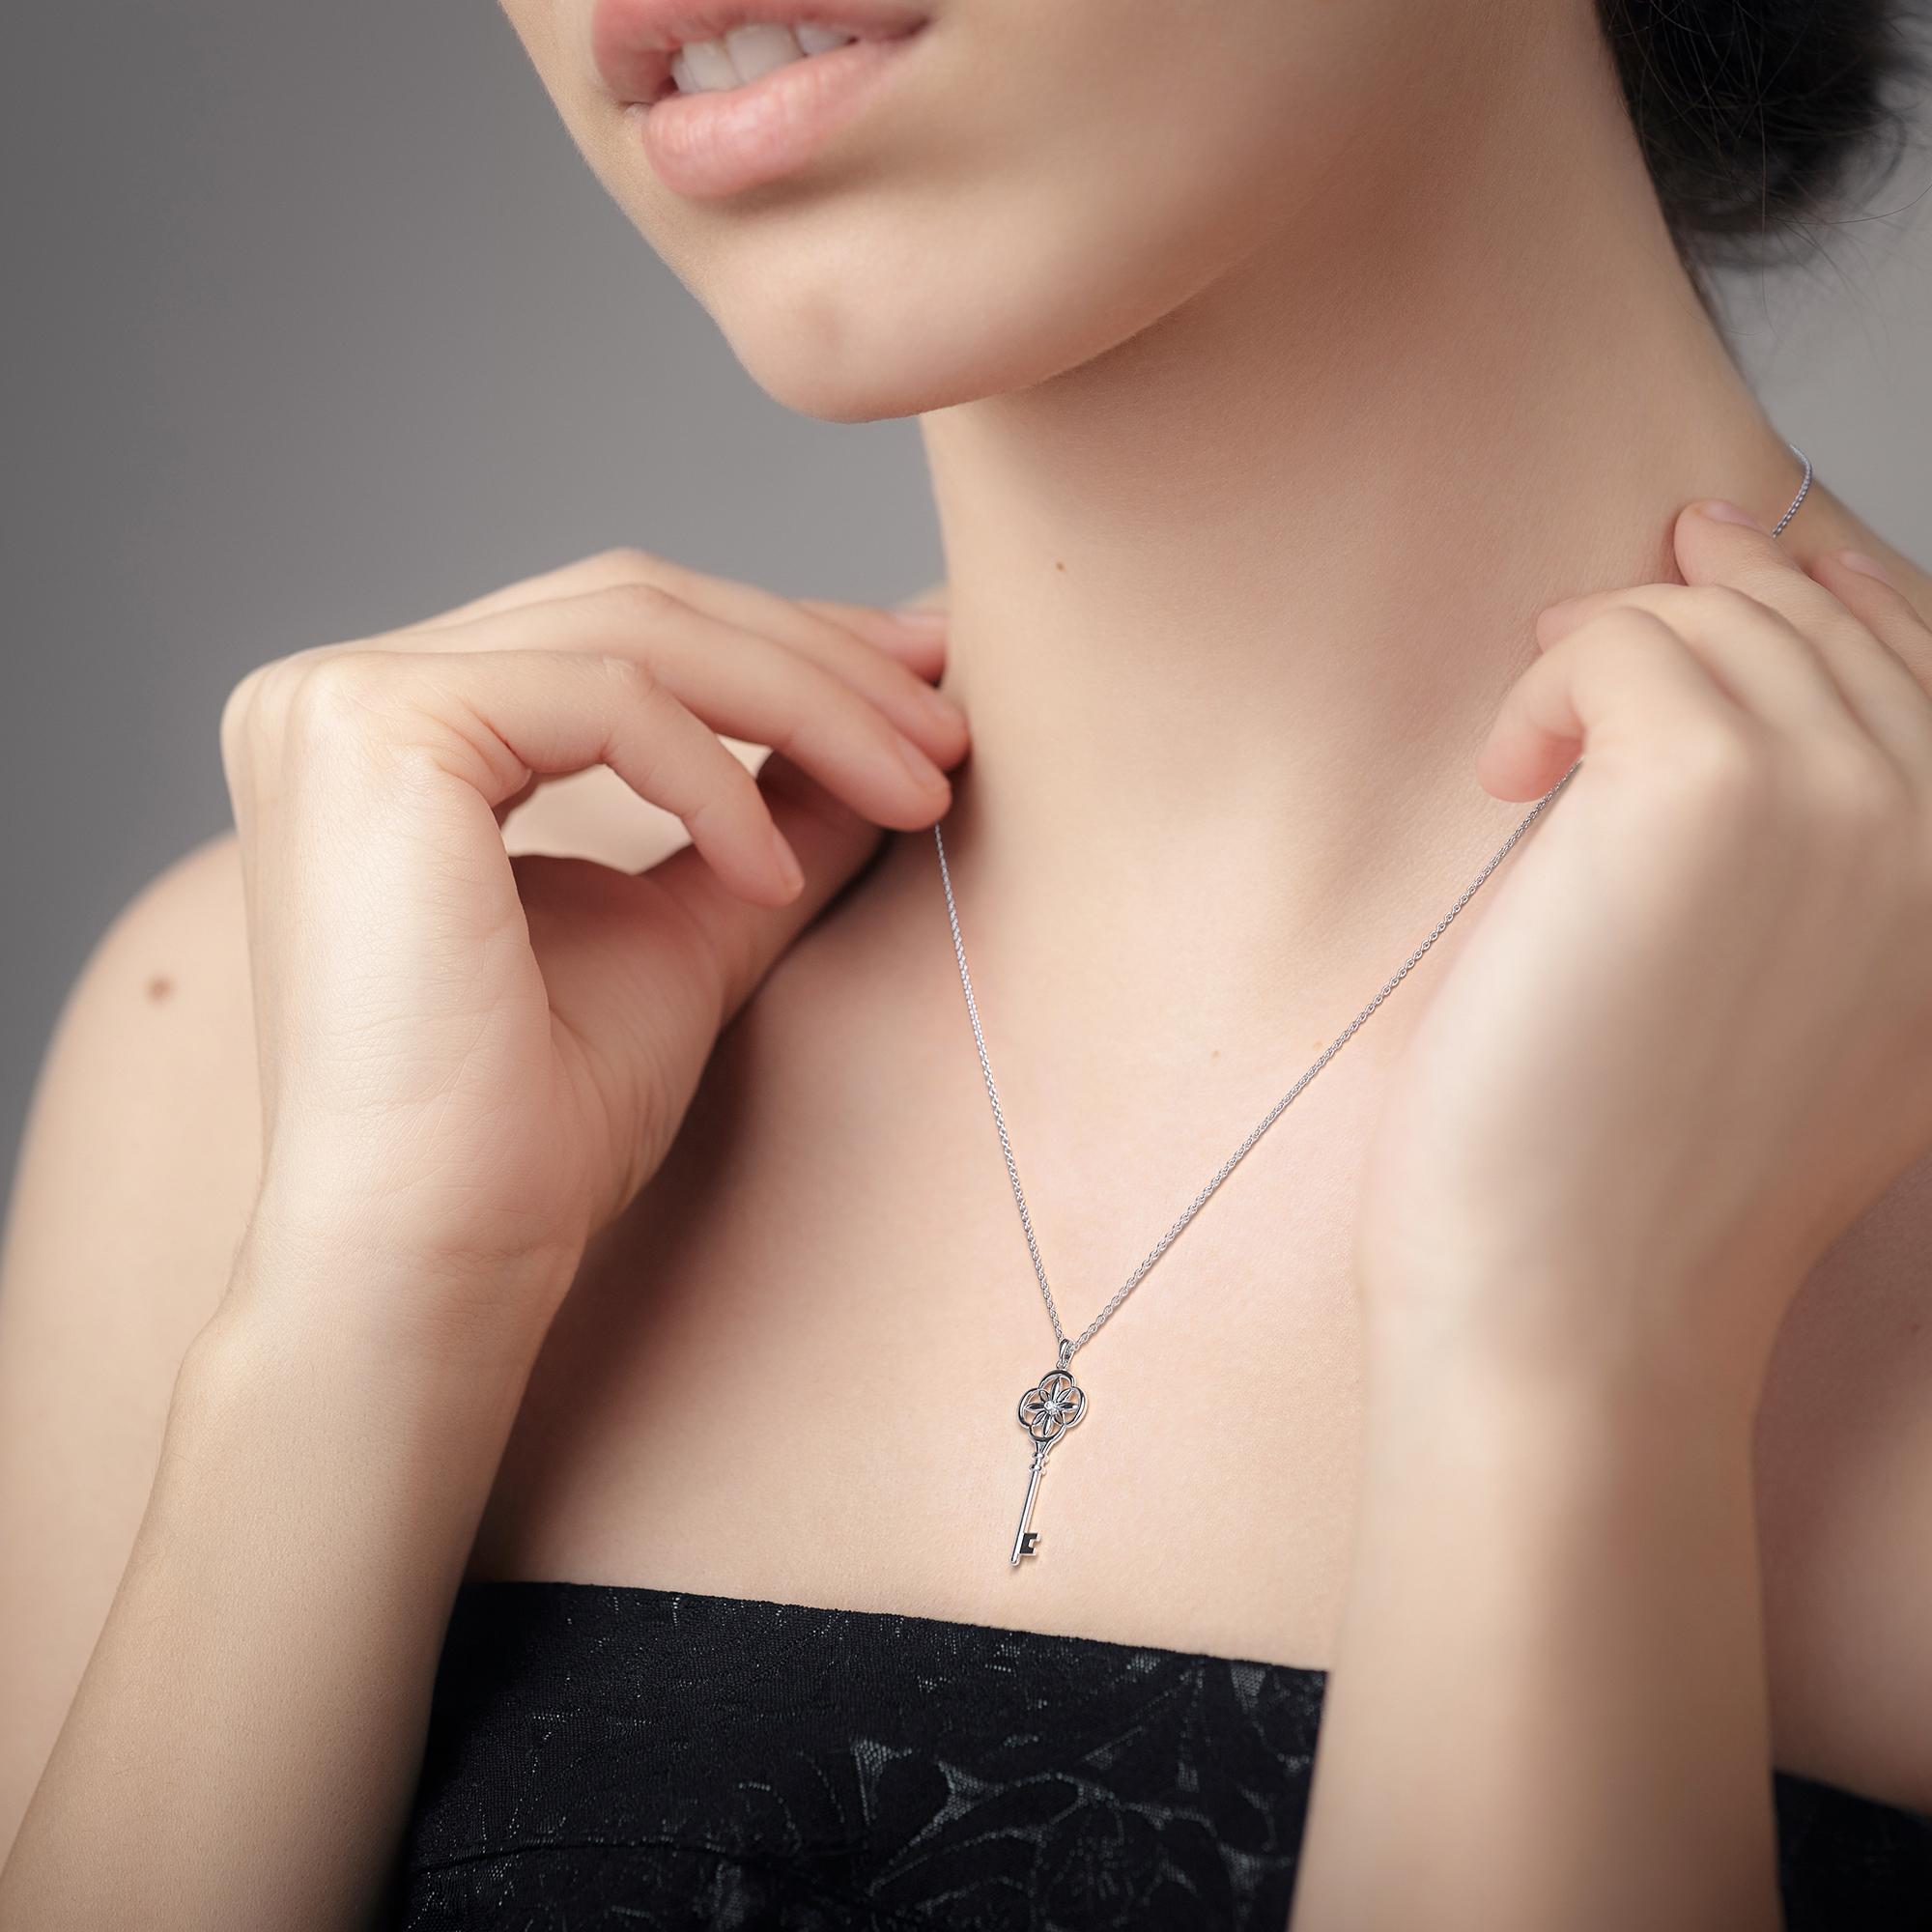 Diamond Pendant Key Pendant Necklace Womens Gift 14K Solid Gold Bridal Jewelry